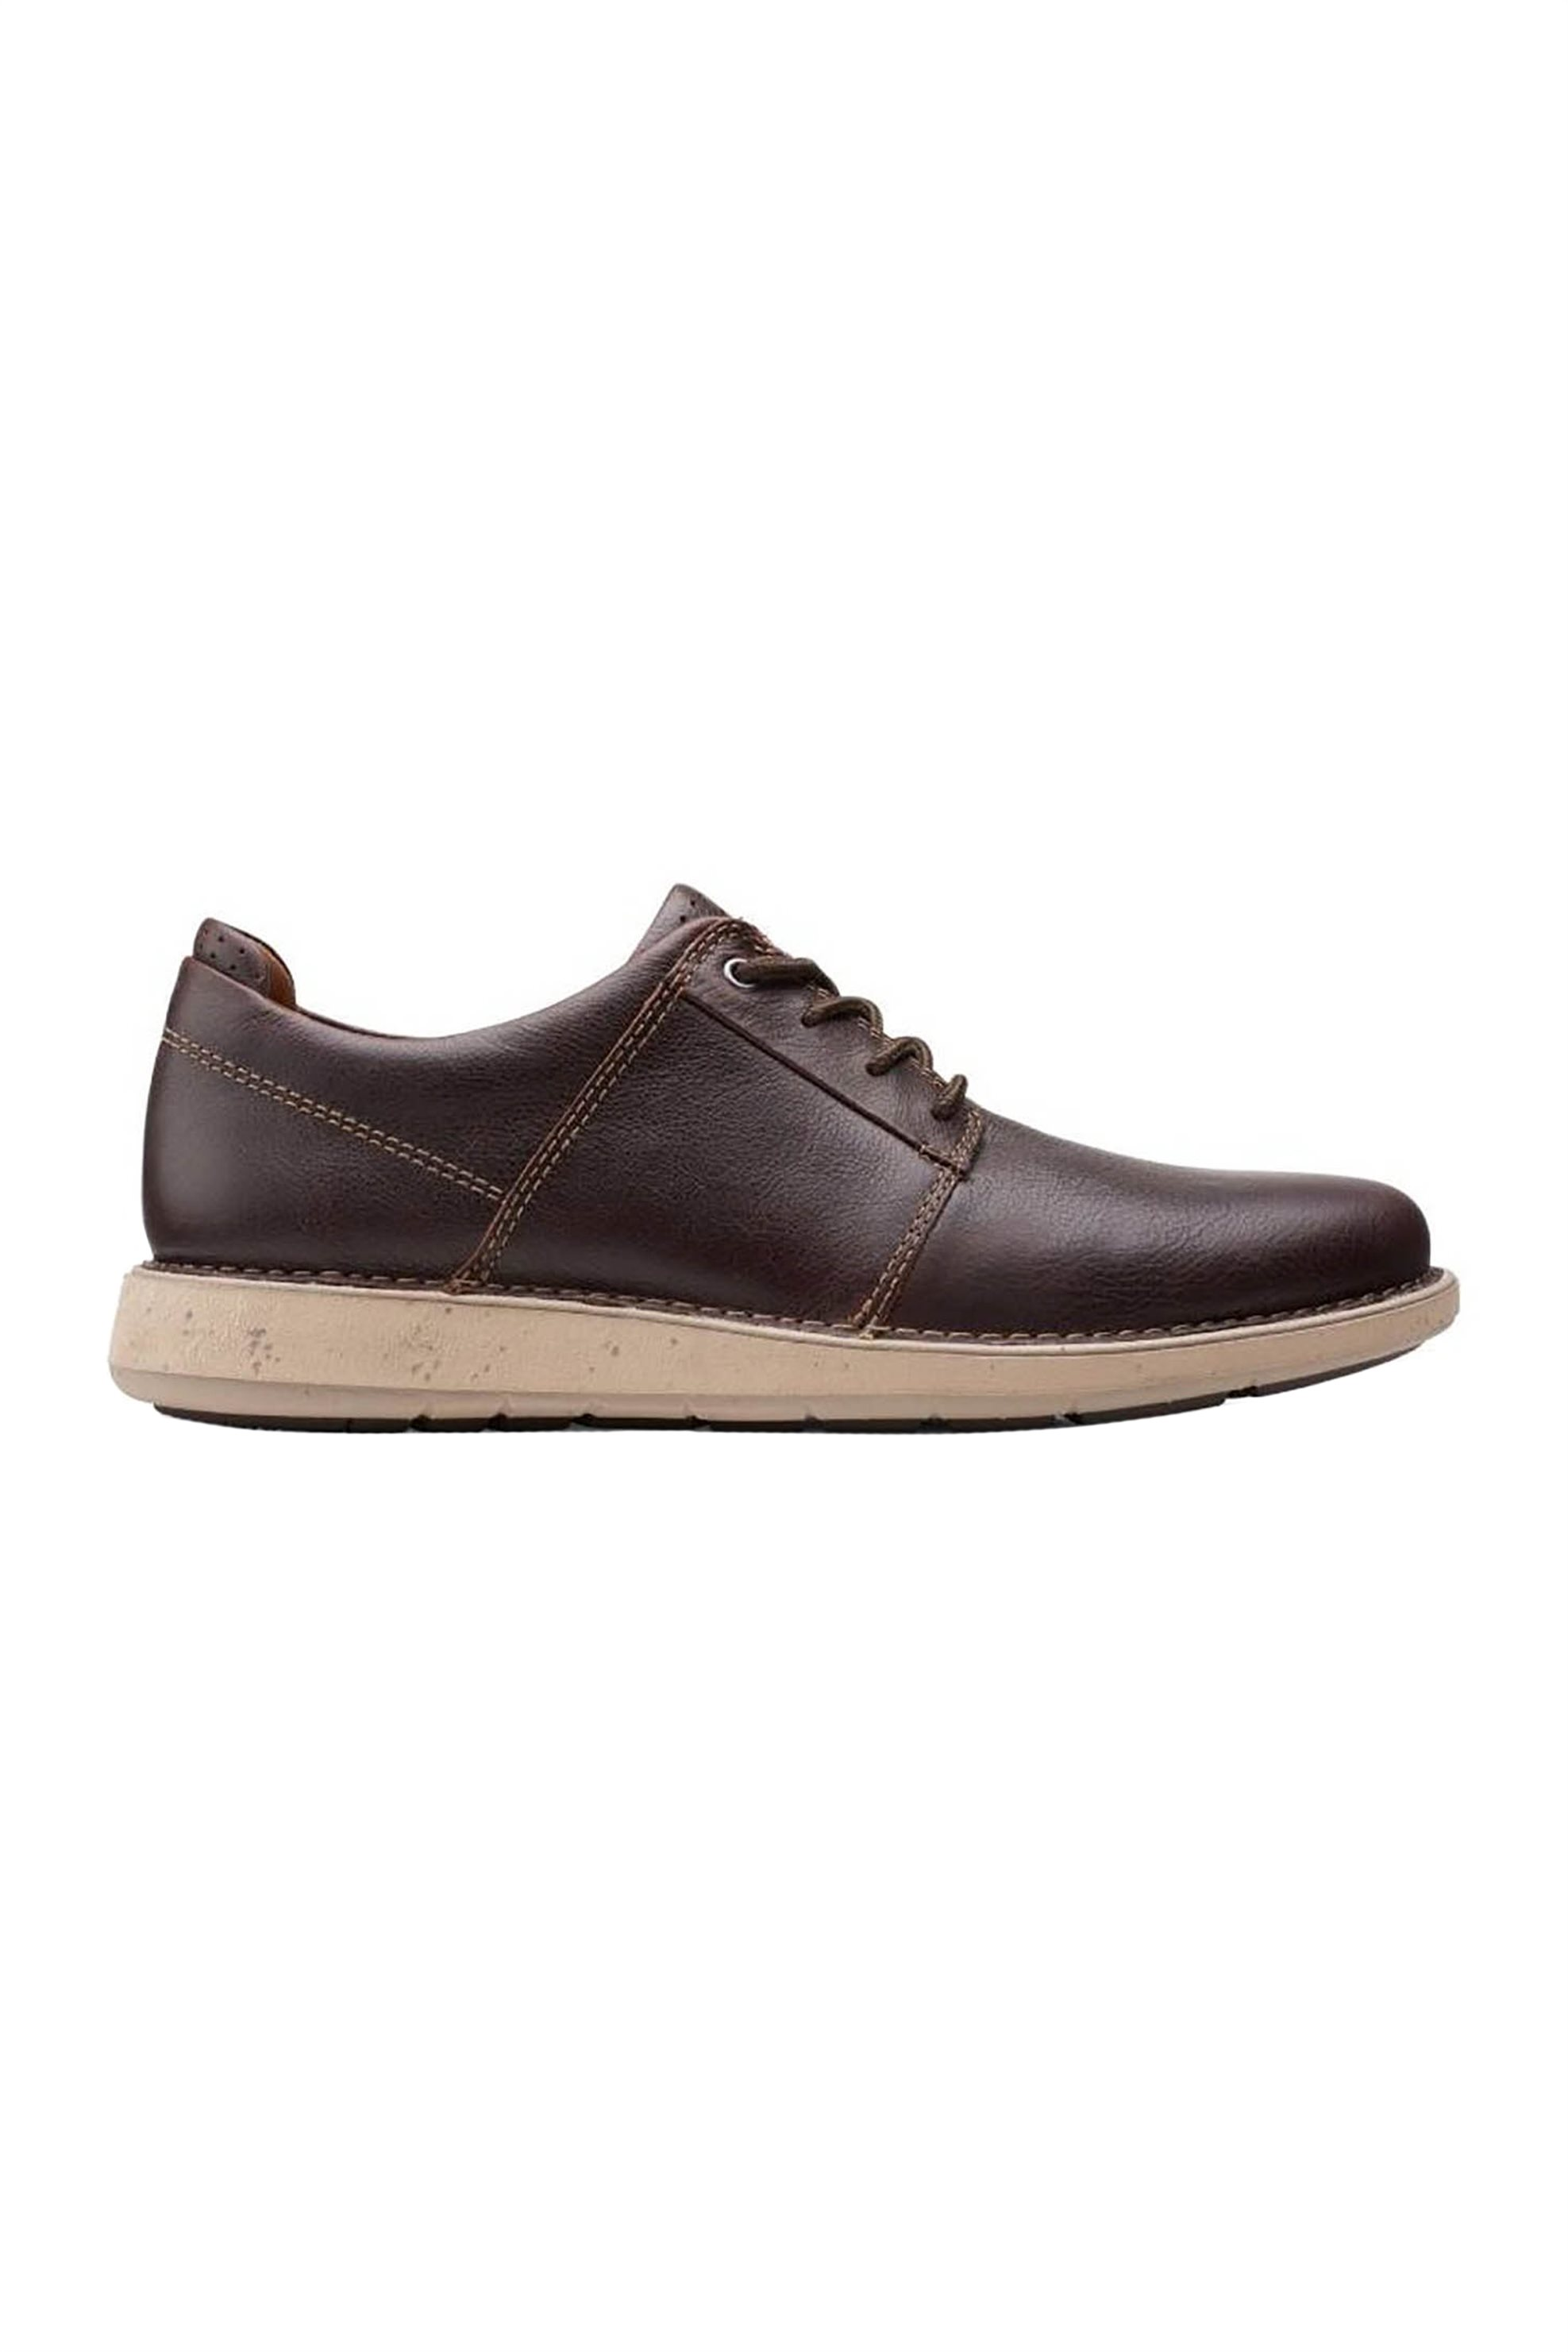 "Clarks ανδρικά δερμάτινα παπούτσια oxford ""Un Larviklace2"" – 26155086 – Καφέ"